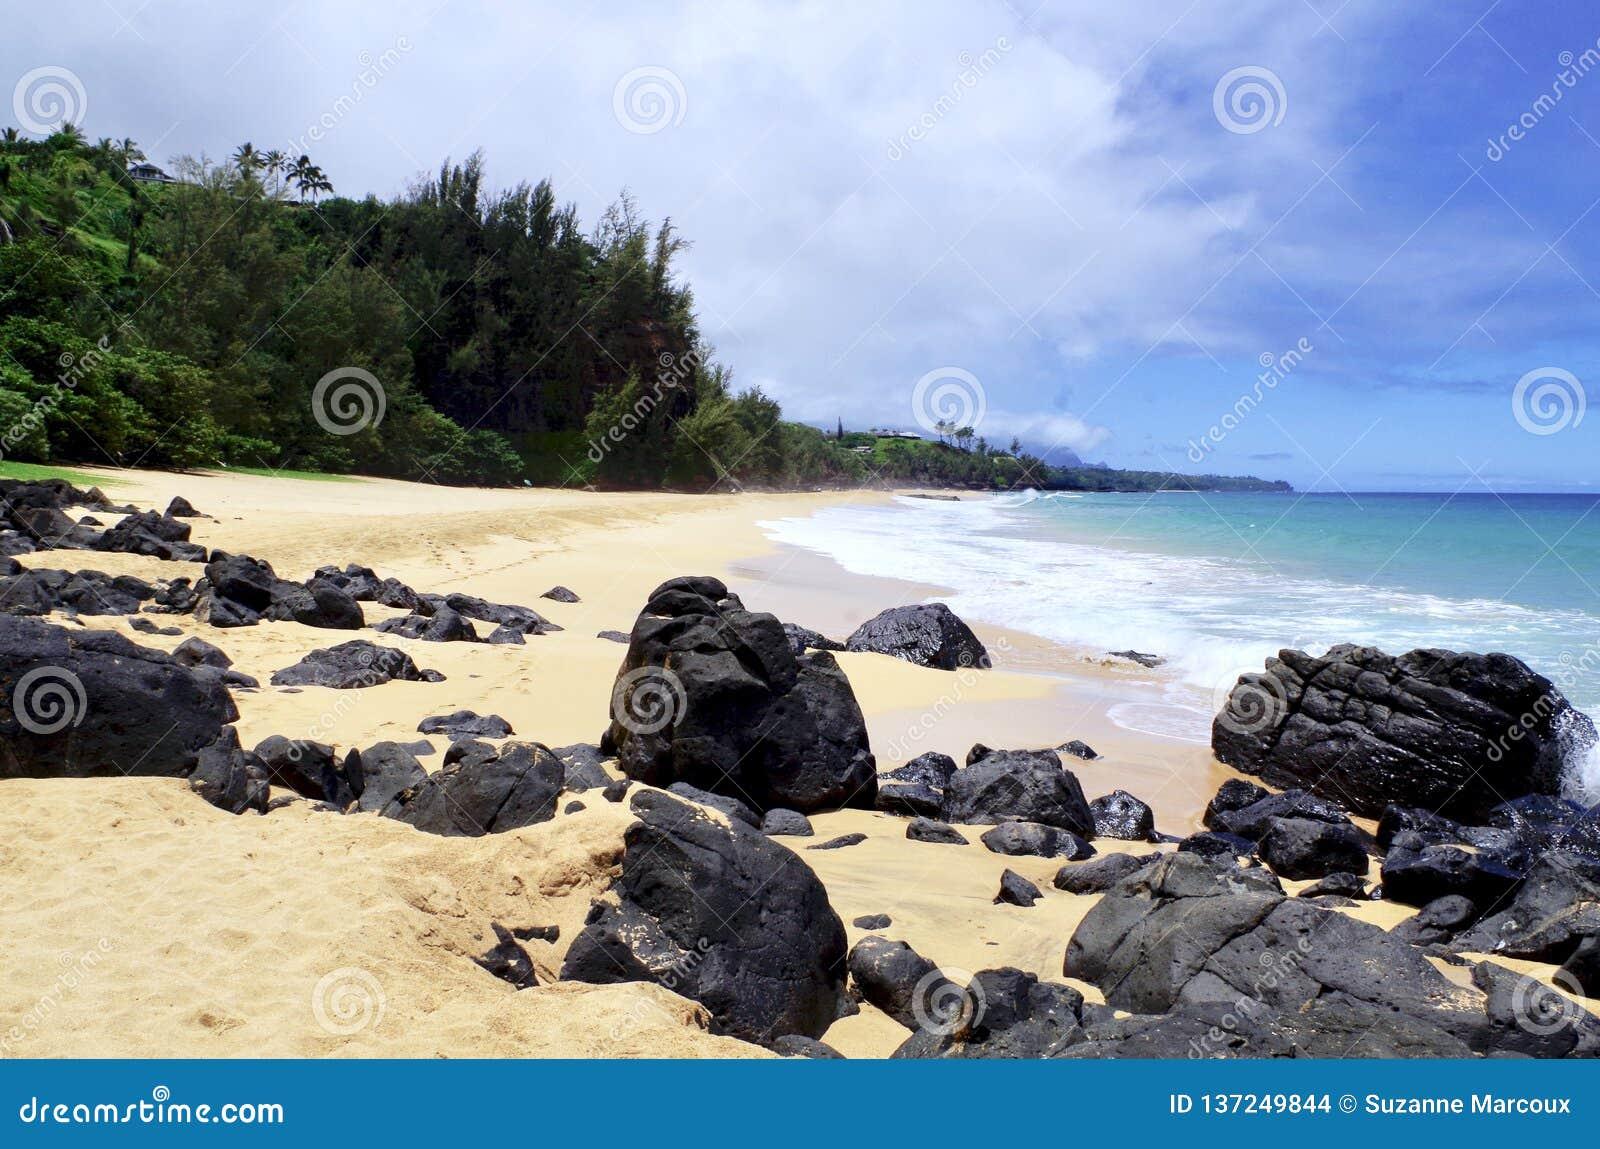 Secret Beach Kauapea Kauai Hawaii Usa Stock Photo Image Of Breathtaking Background 137249844